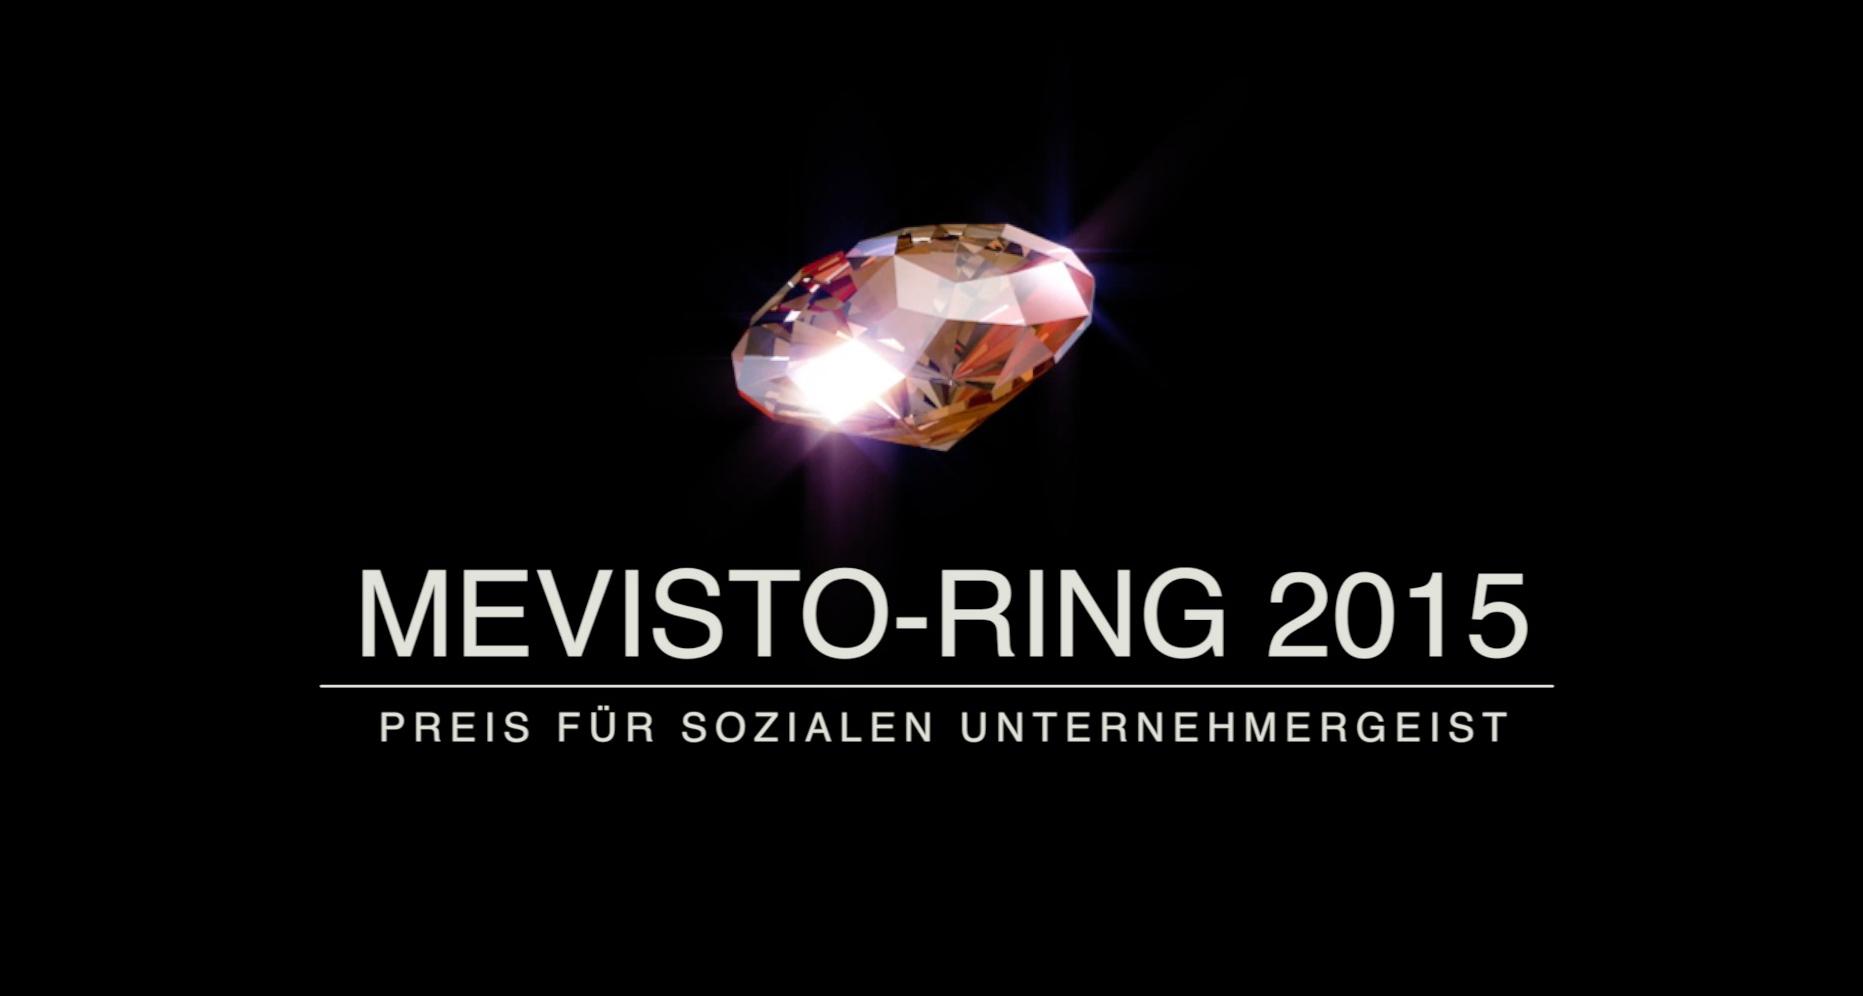 MEVISTO-Ring